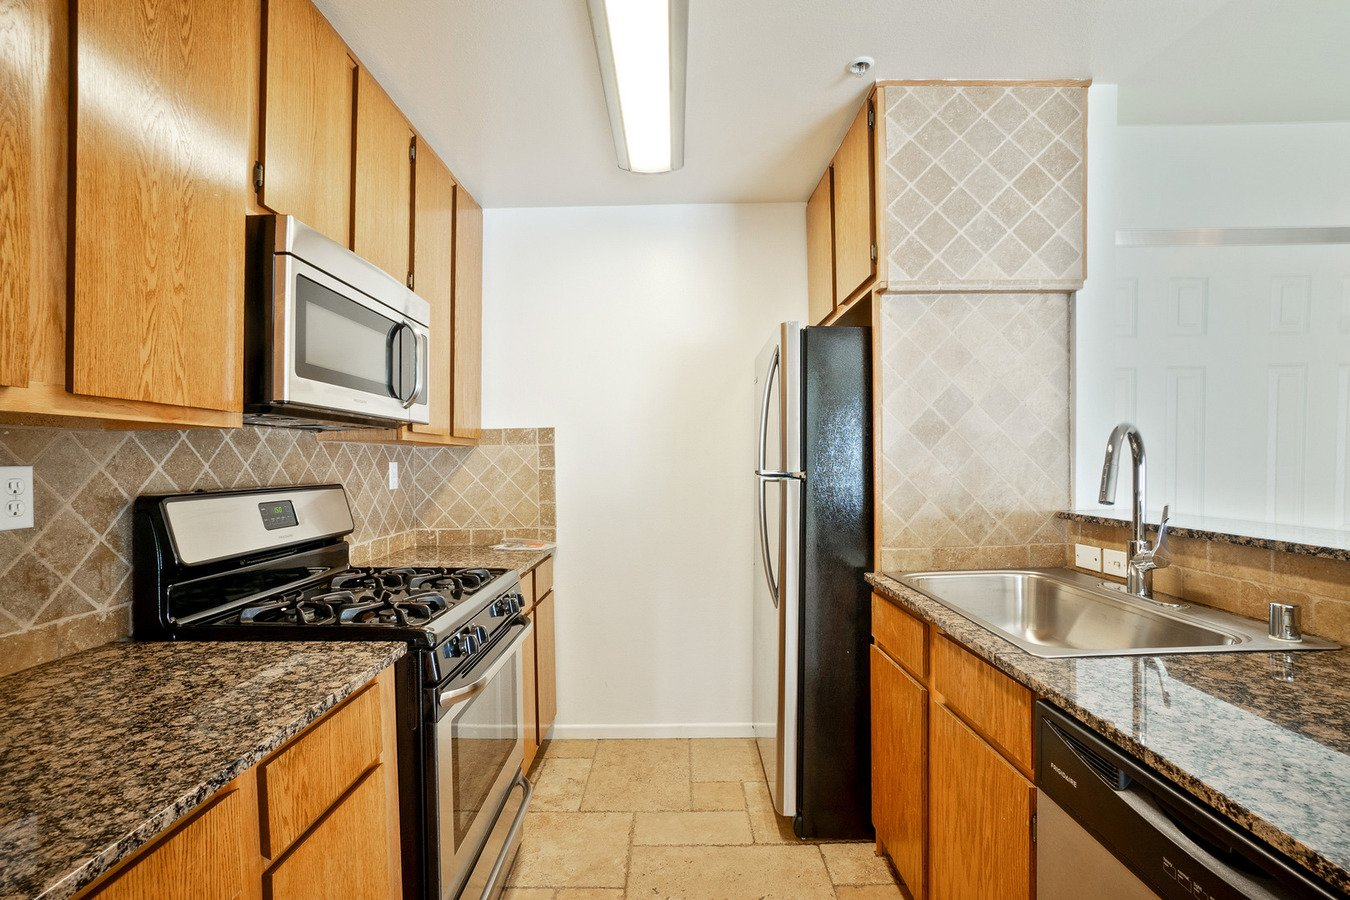 1 Bedroom 1 Bathroom Apartment for rent at Sophia Ridge in Reseda, CA